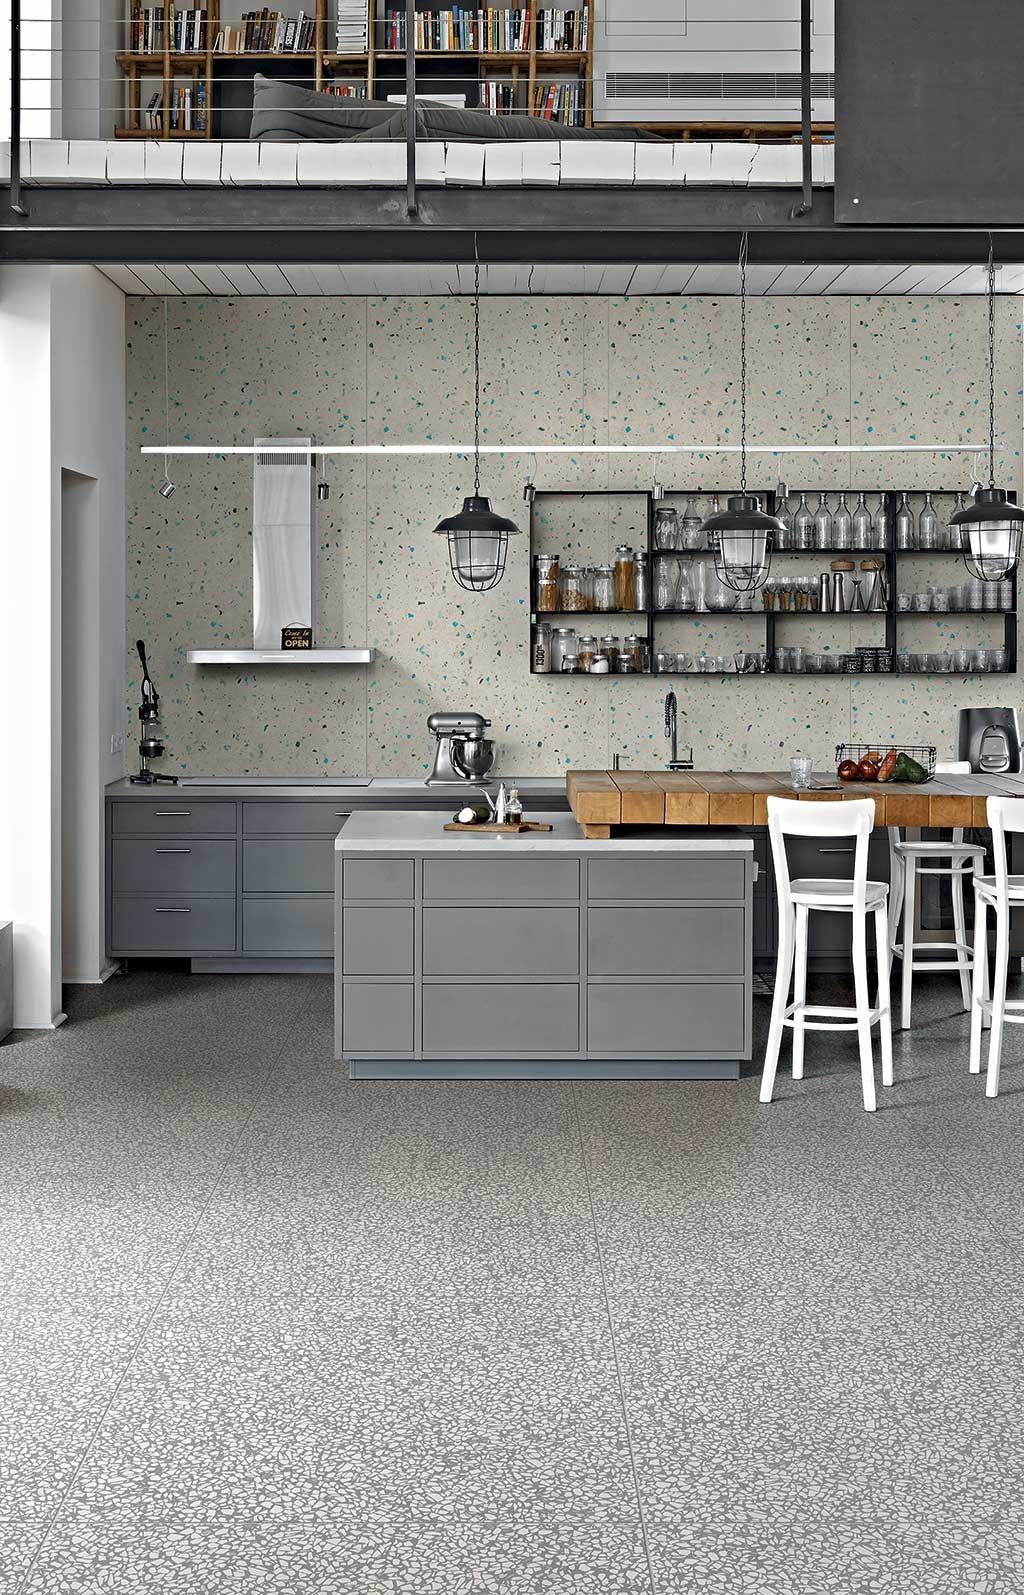 Cuisine Style Industrielle Carrelage Imitation Terrazzo Gris